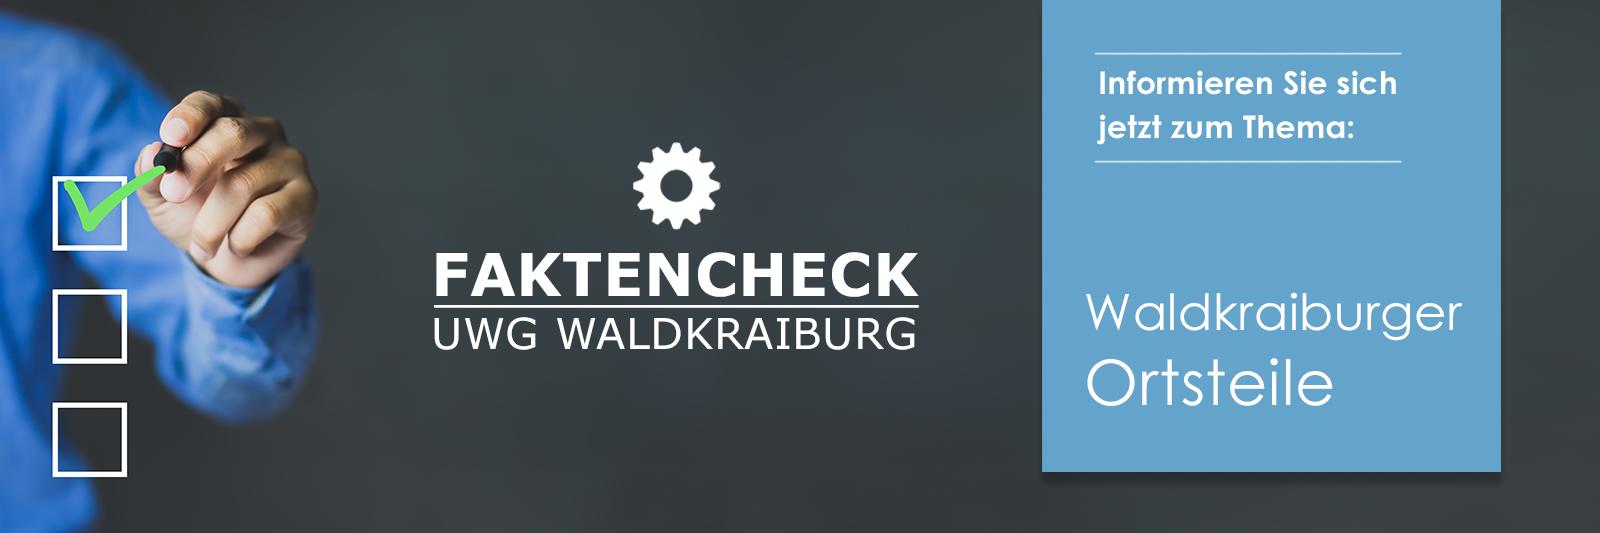 UWG Faktencheck Waldkraiburger Ortsteile